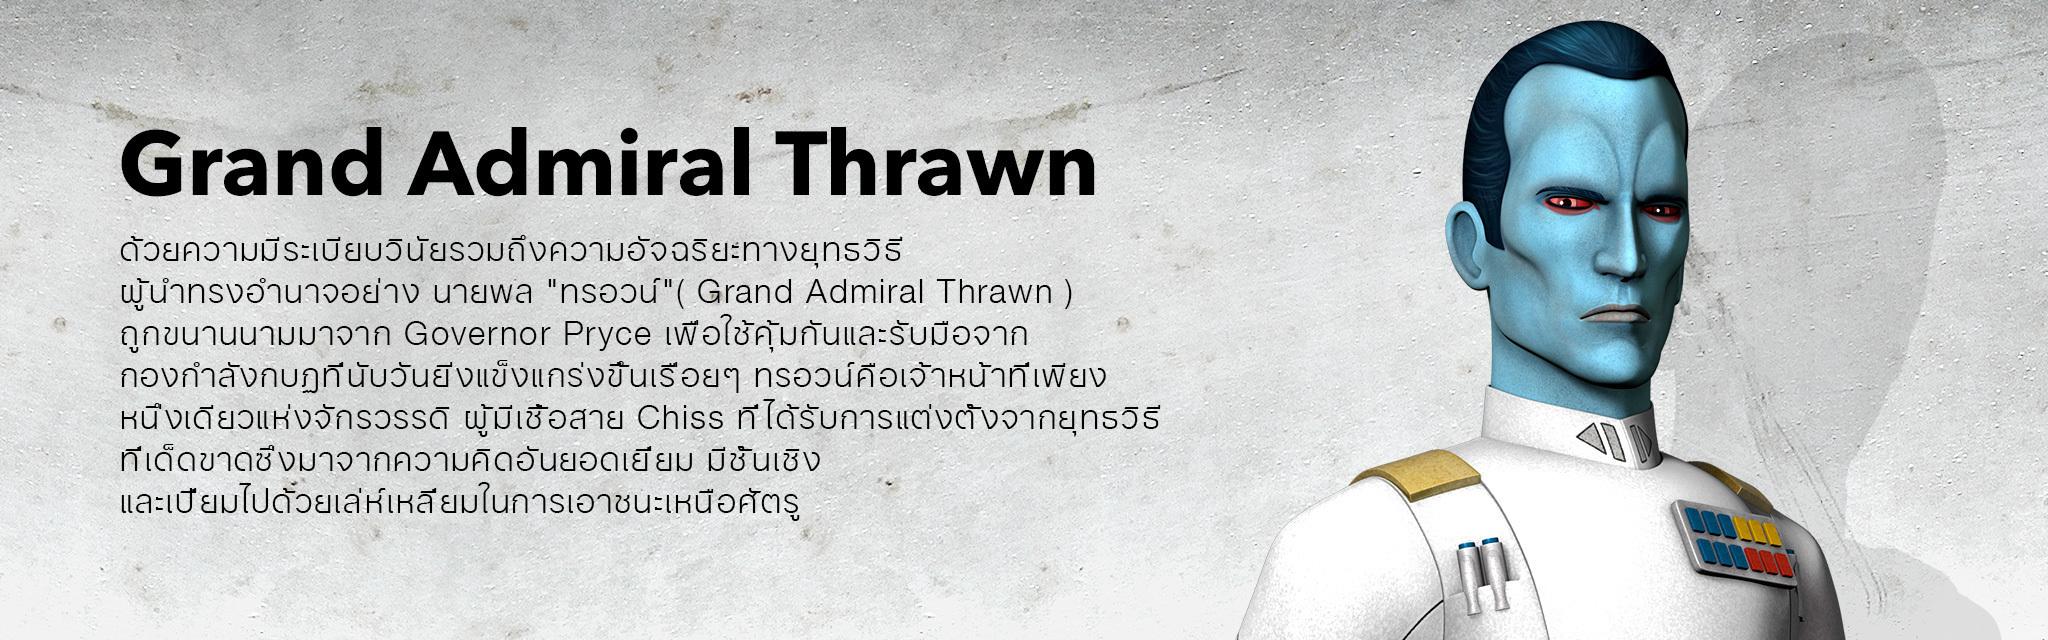 Star Wars Rebels Season 3 - Grand Admiral Thrawn - Hero